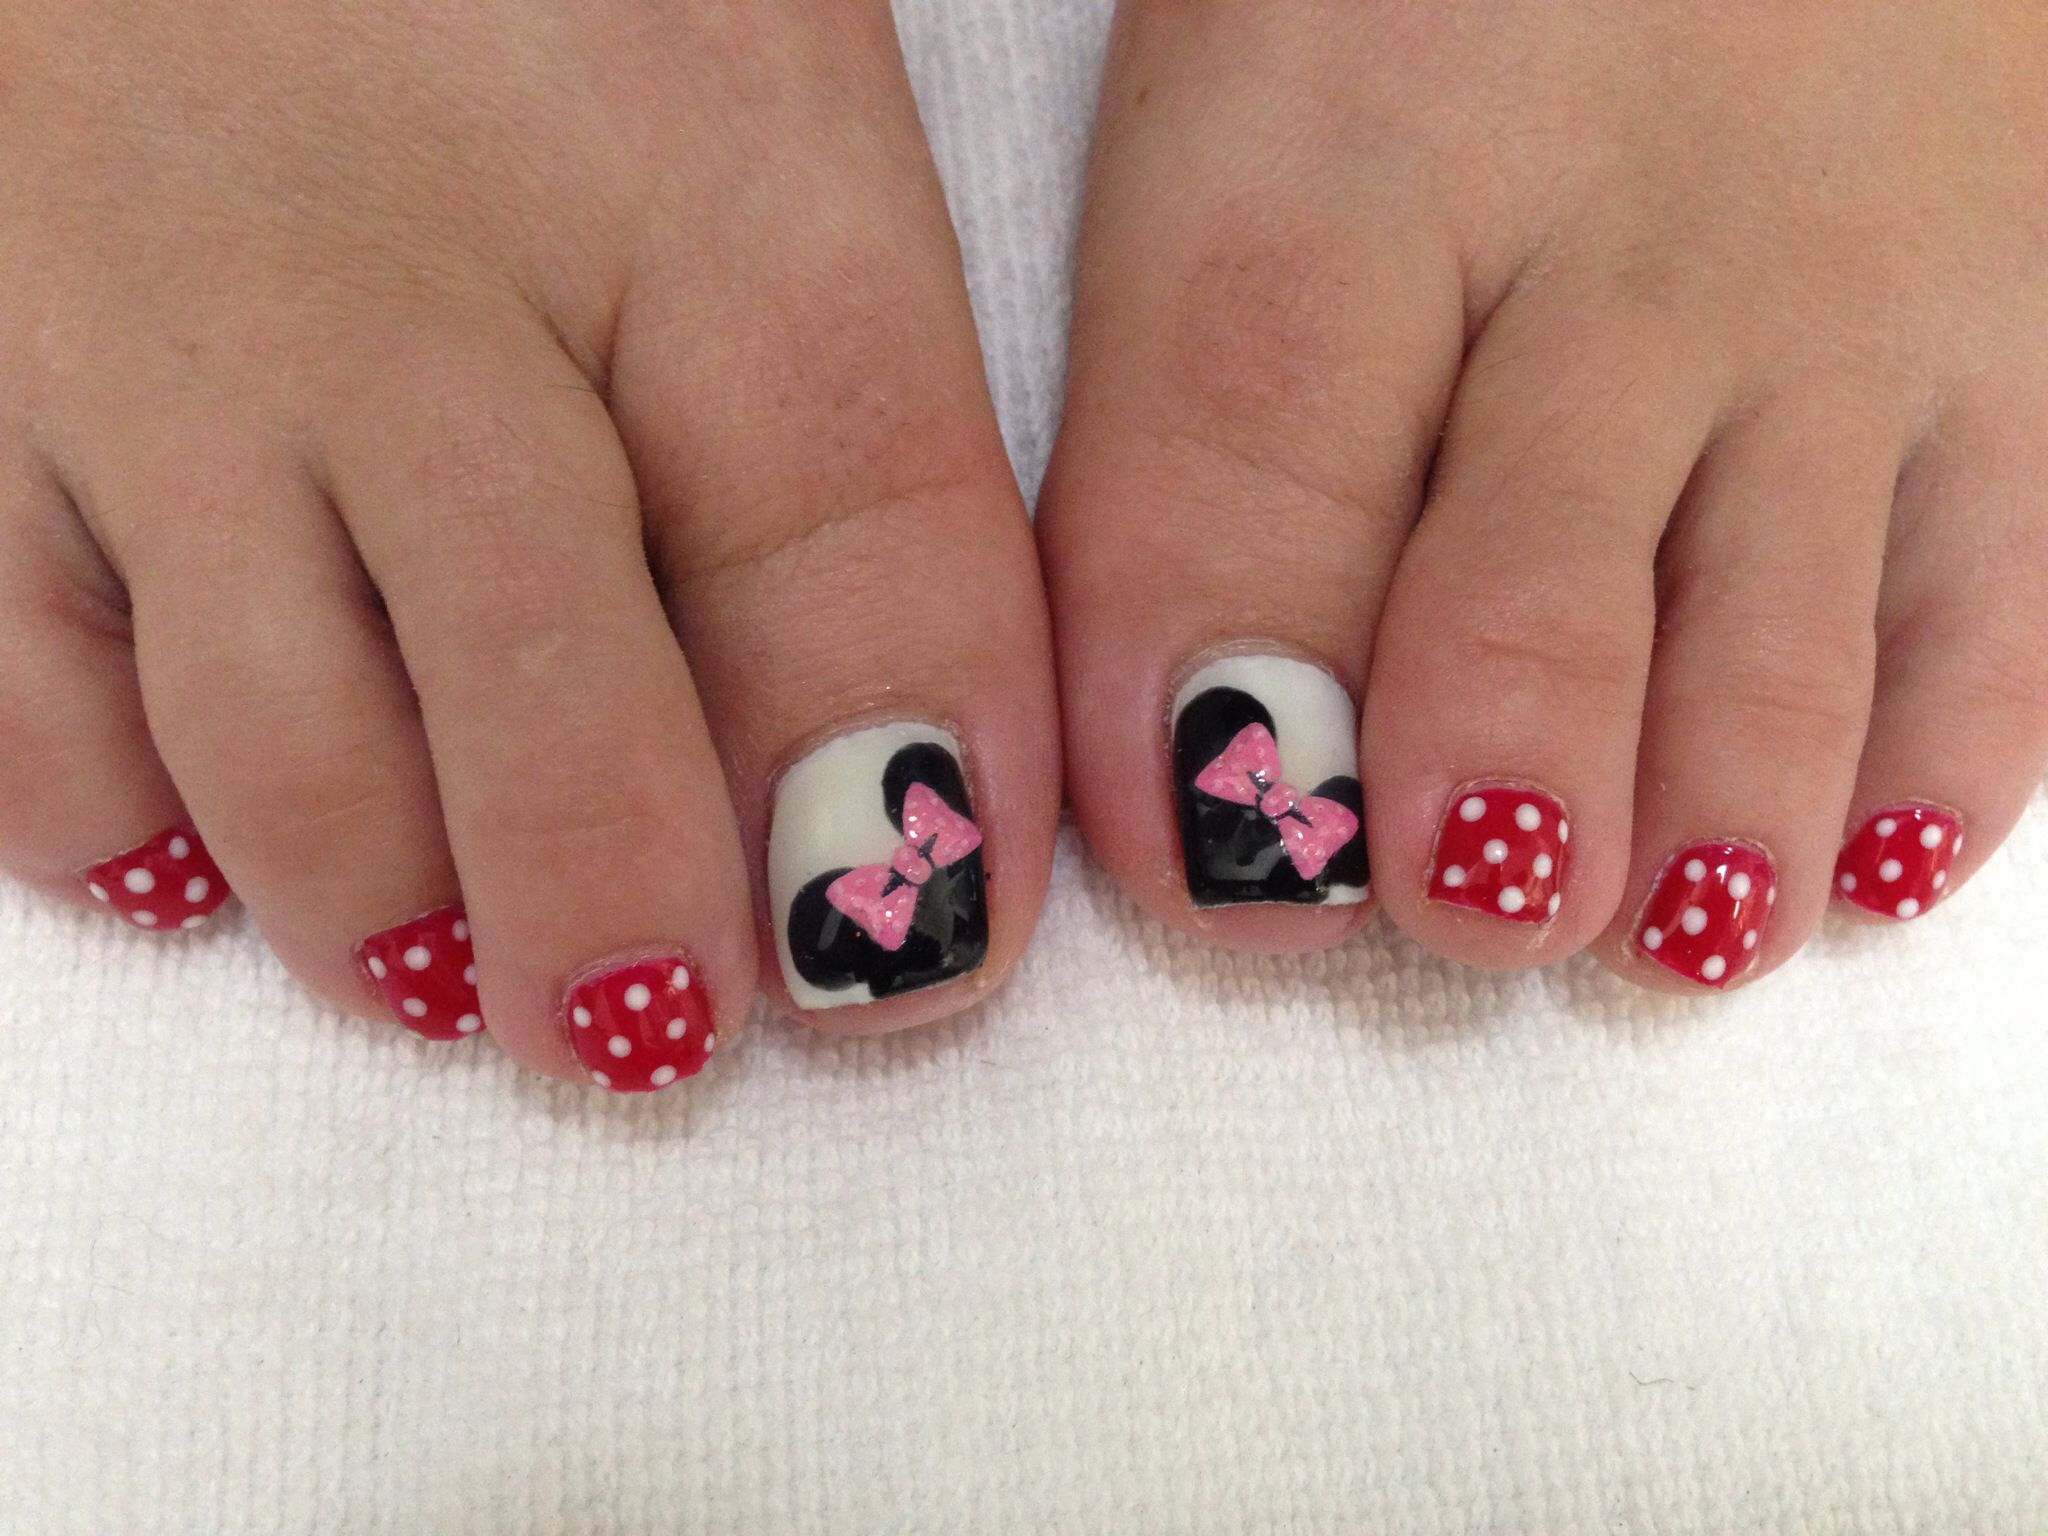 Pin By Samantha Perez On My Job Disney Toe Nails Disney Nails Mickey Nails